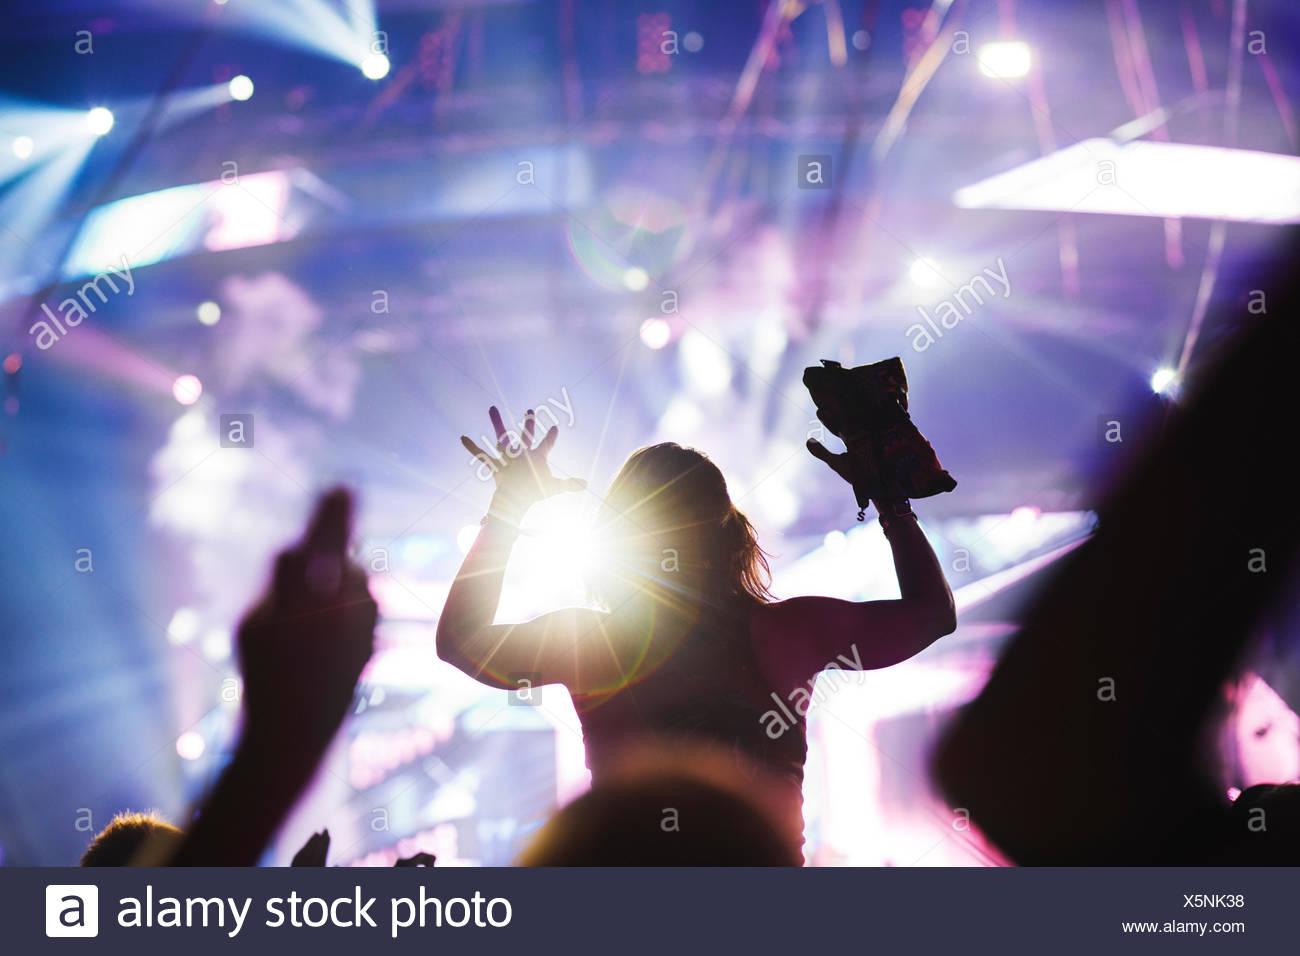 La Finlande, Helsinki, Uusimaa, encourageant les jeunes femmes à Summer Sound Festival Photo Stock